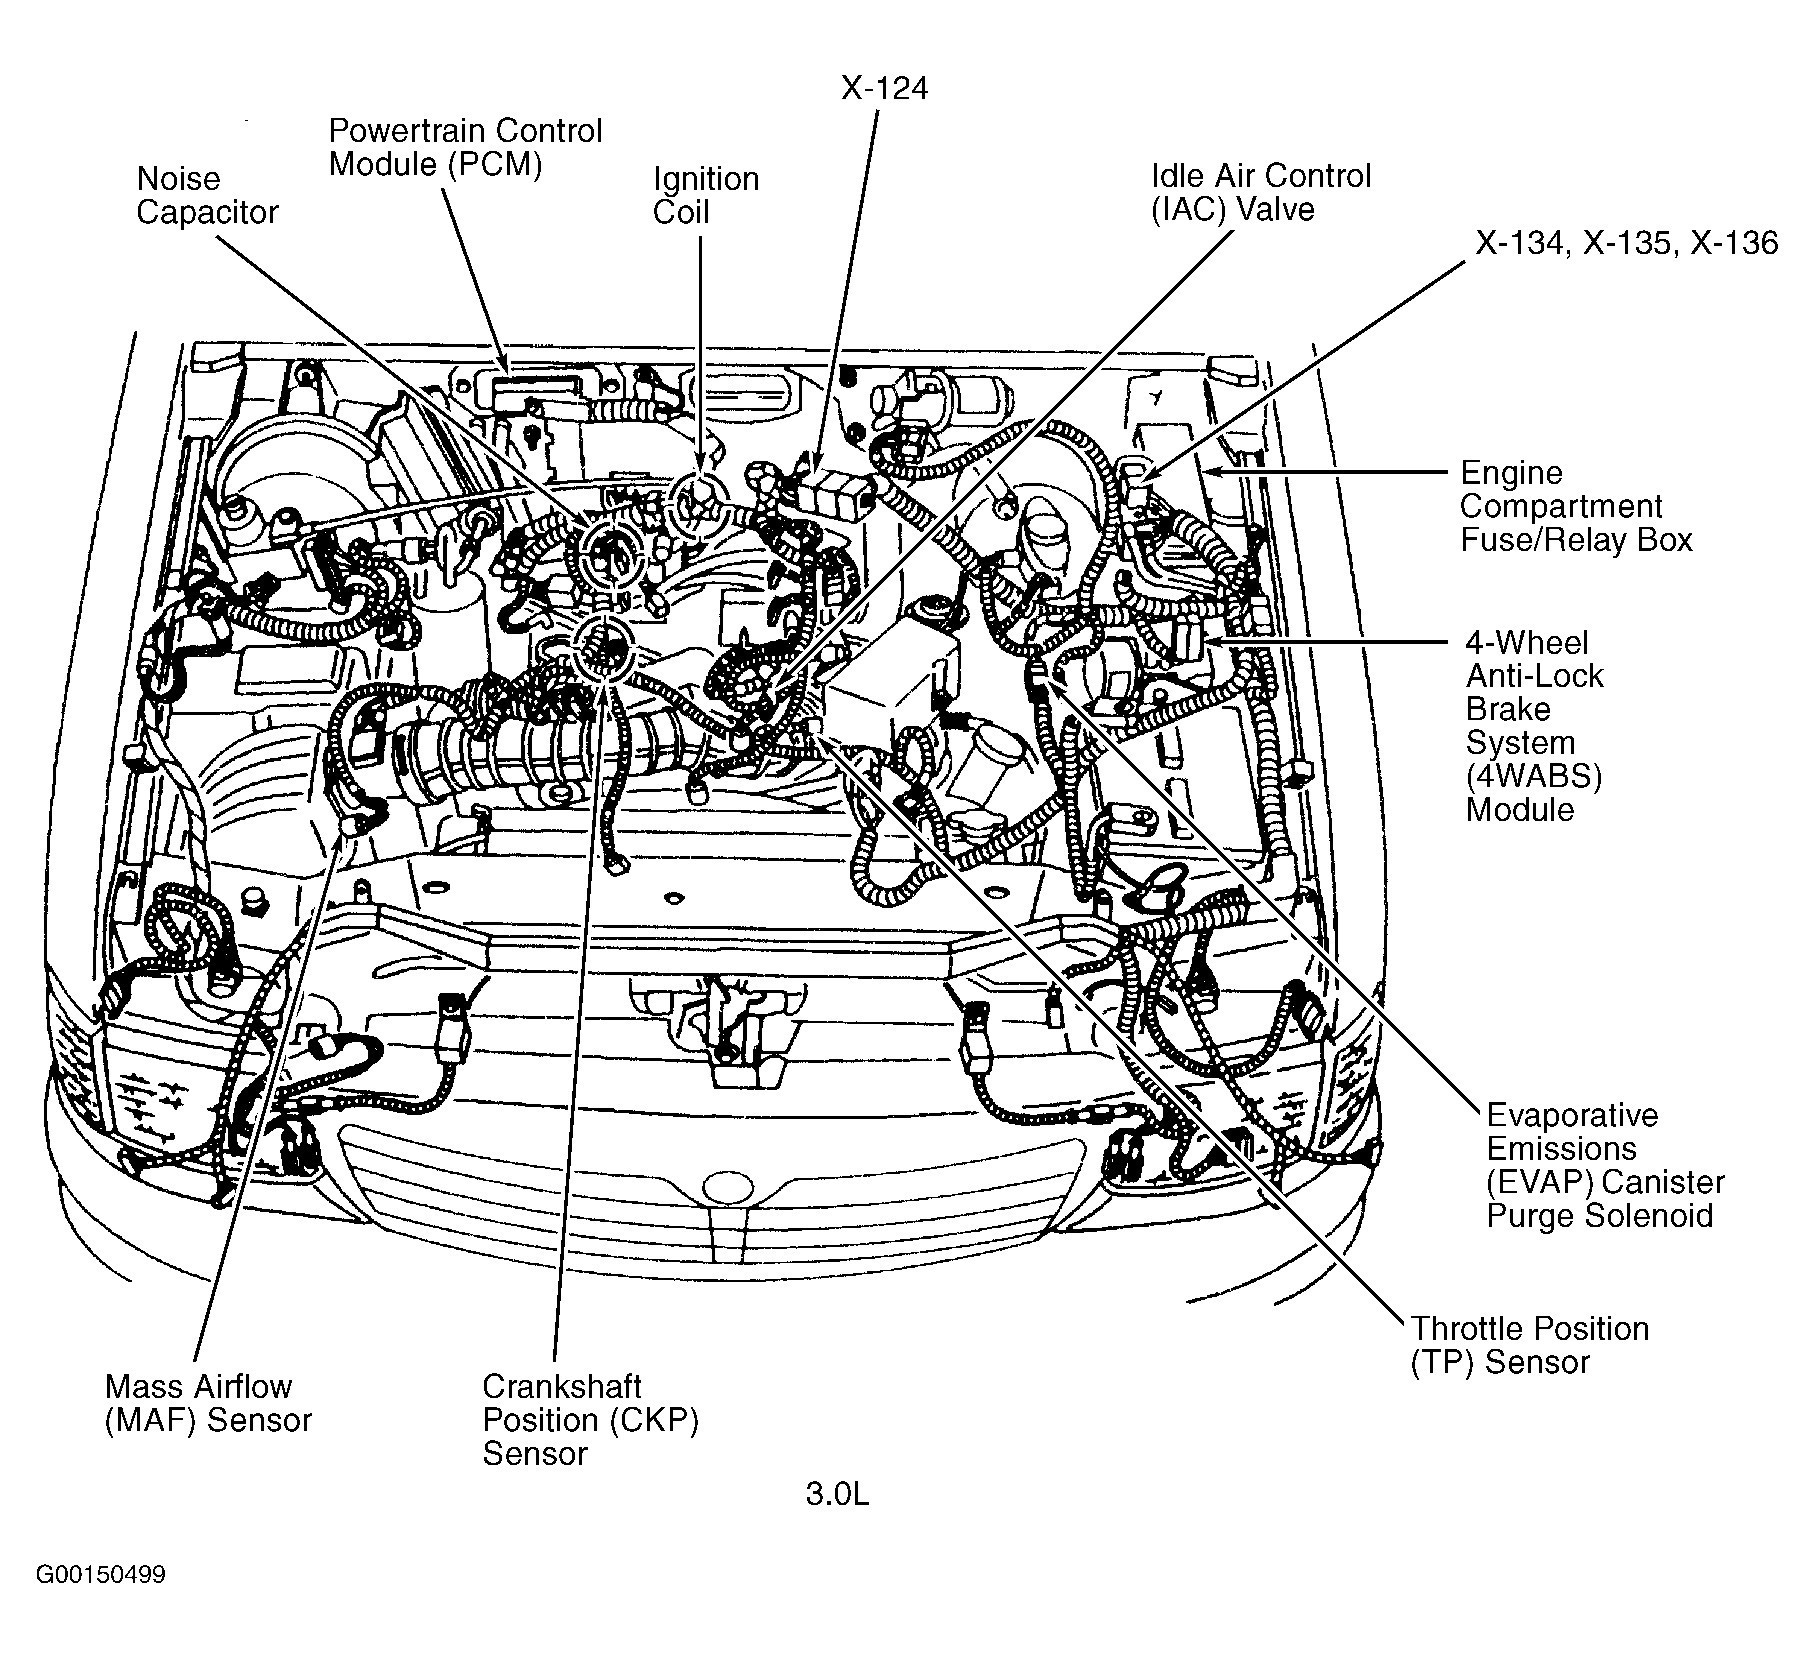 Mazda 6 Wiring Diagram New Mazda 6 Wiring Diagram Sample Pdf Mazda B3000 Engine Diagram Fresh